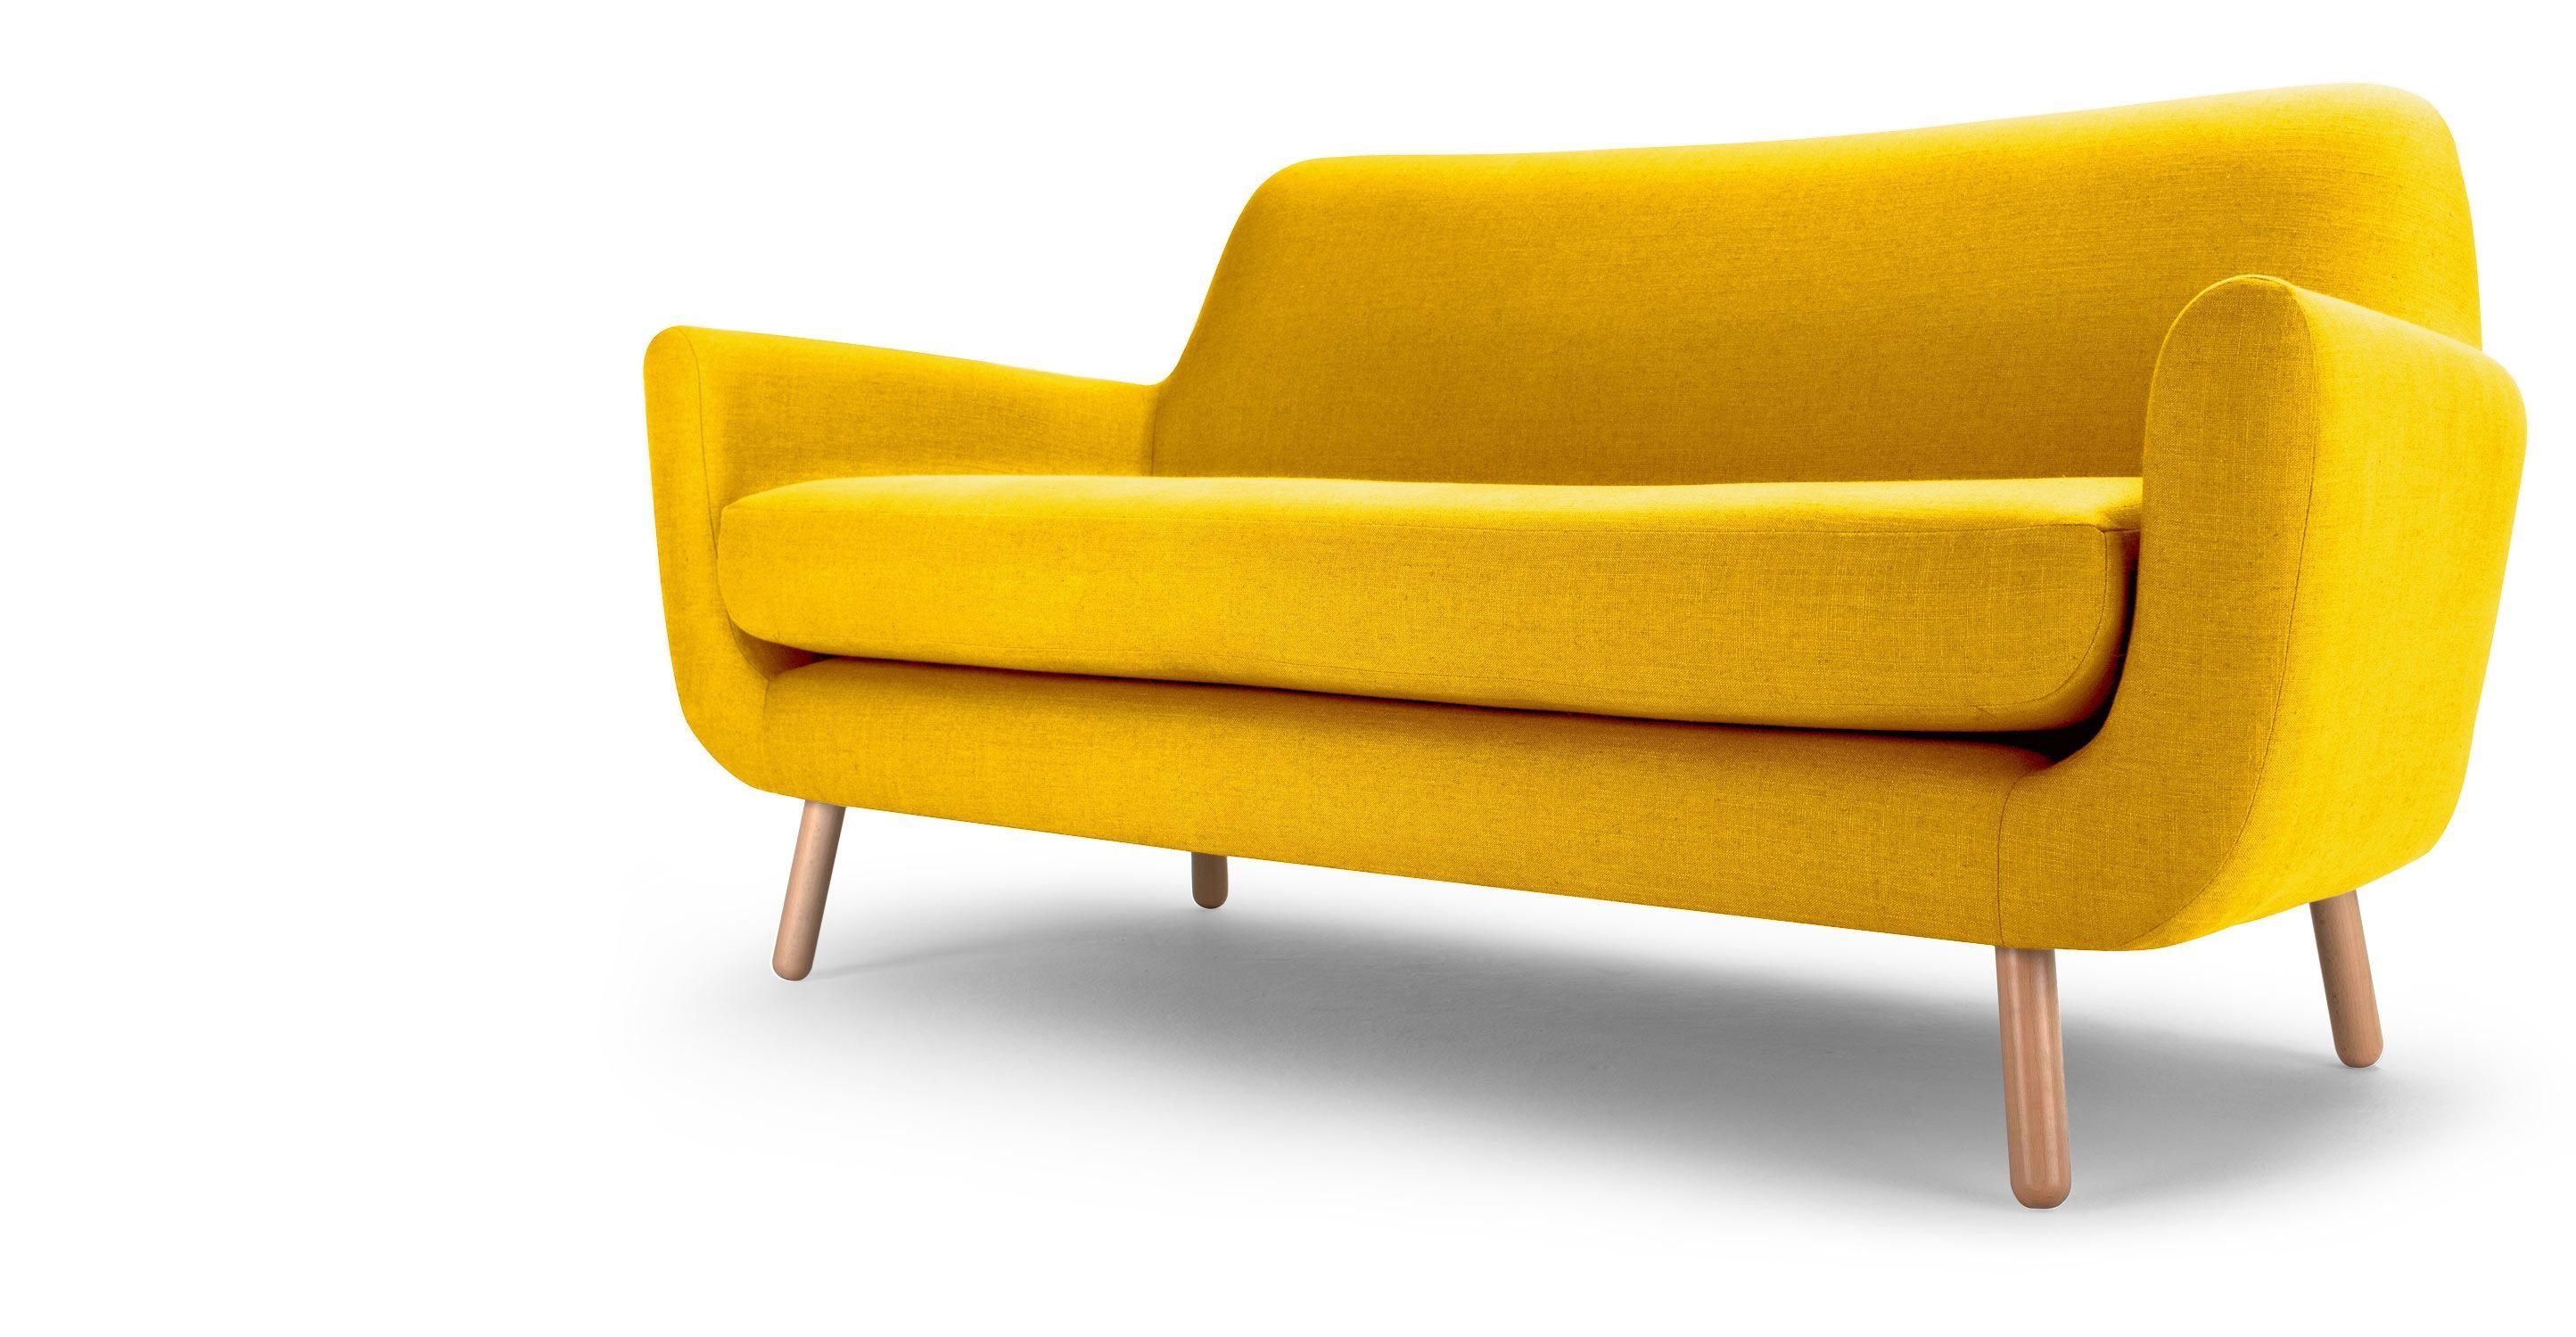 Jonah 2 Sitzer Sofa Sonnenblumengelb Yellow Sofa Sofa Seater Sofa